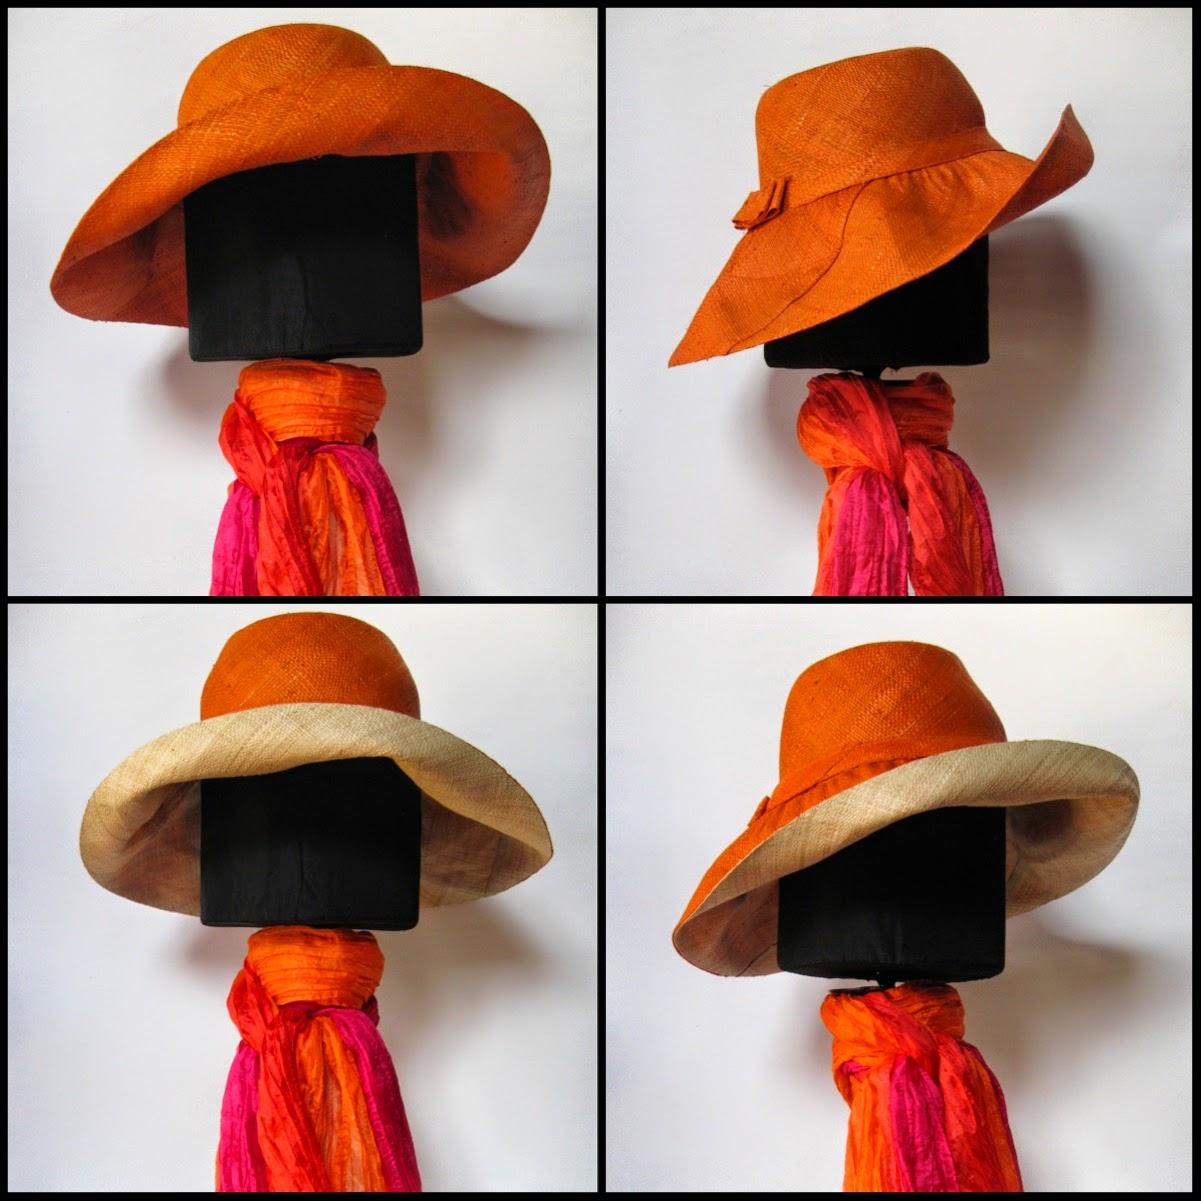 stråhatte, hatte, solhatte, hats, samarkanddk, jane eberlein, silketørklæder, sobralkæder, bryllupshatte, bryllup, damehatte, sommerhatte